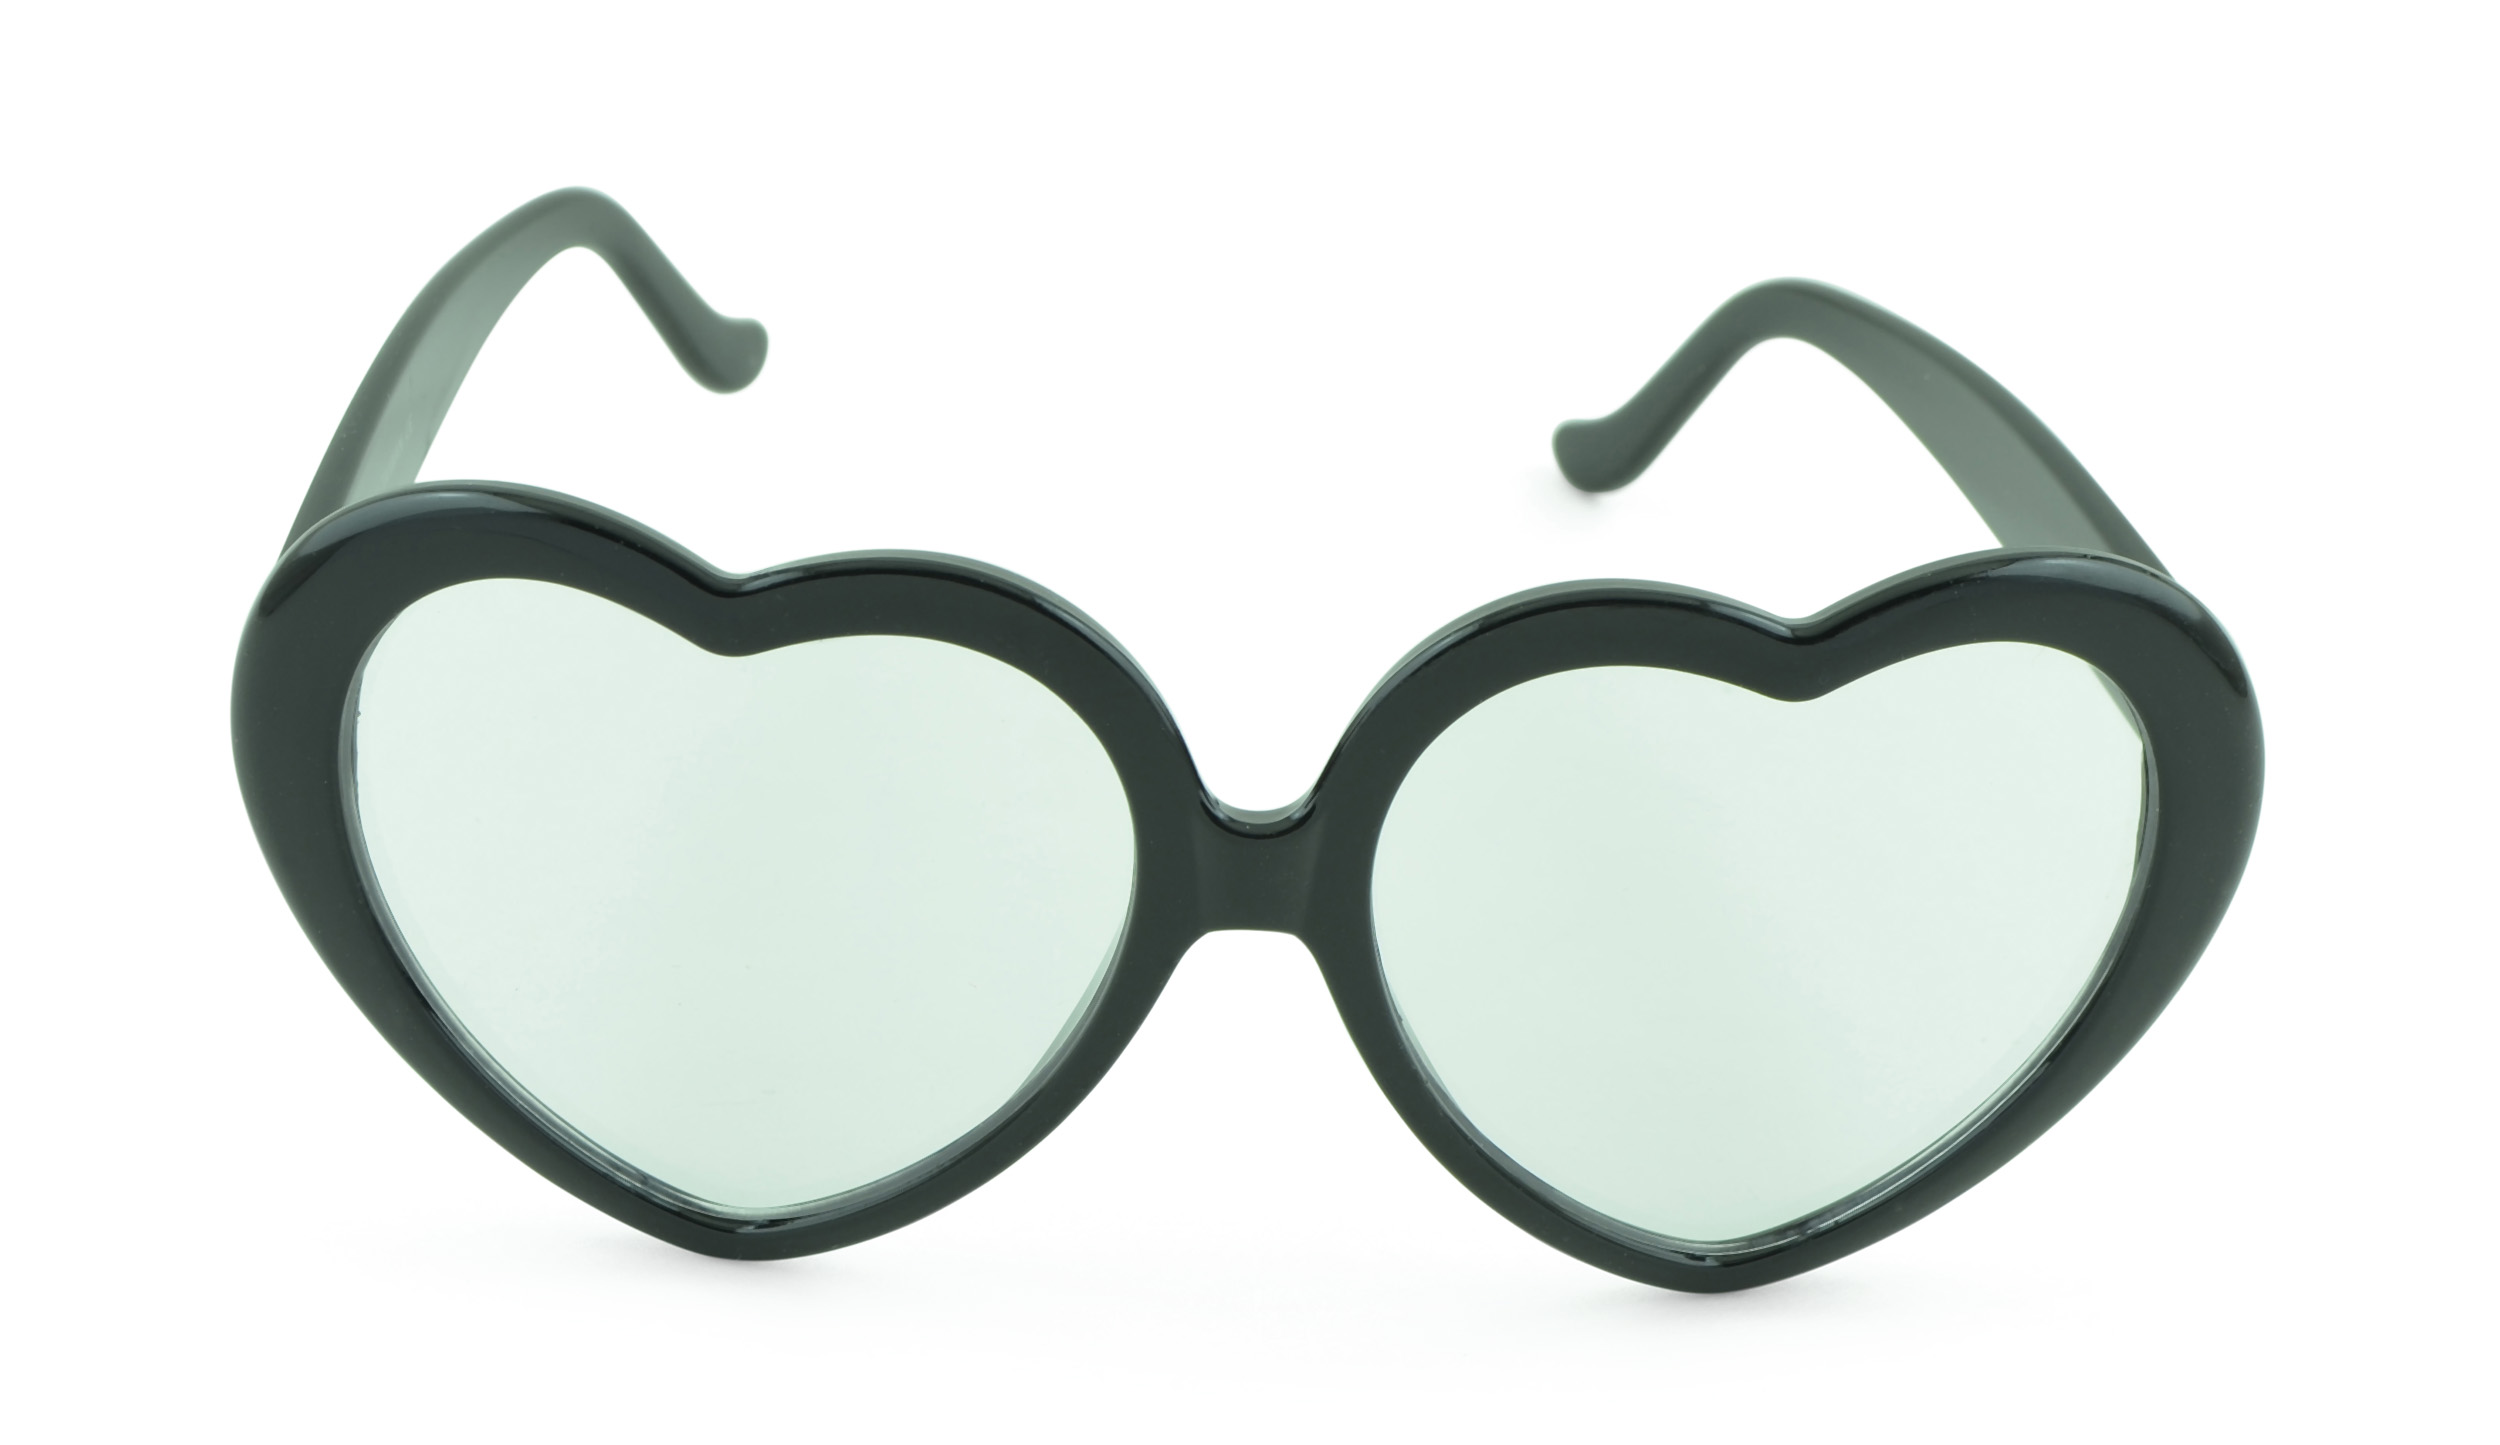 Belle Donne- Womens Cute Shades Fashion Trendy Heart Shaped Sunglasses-Black